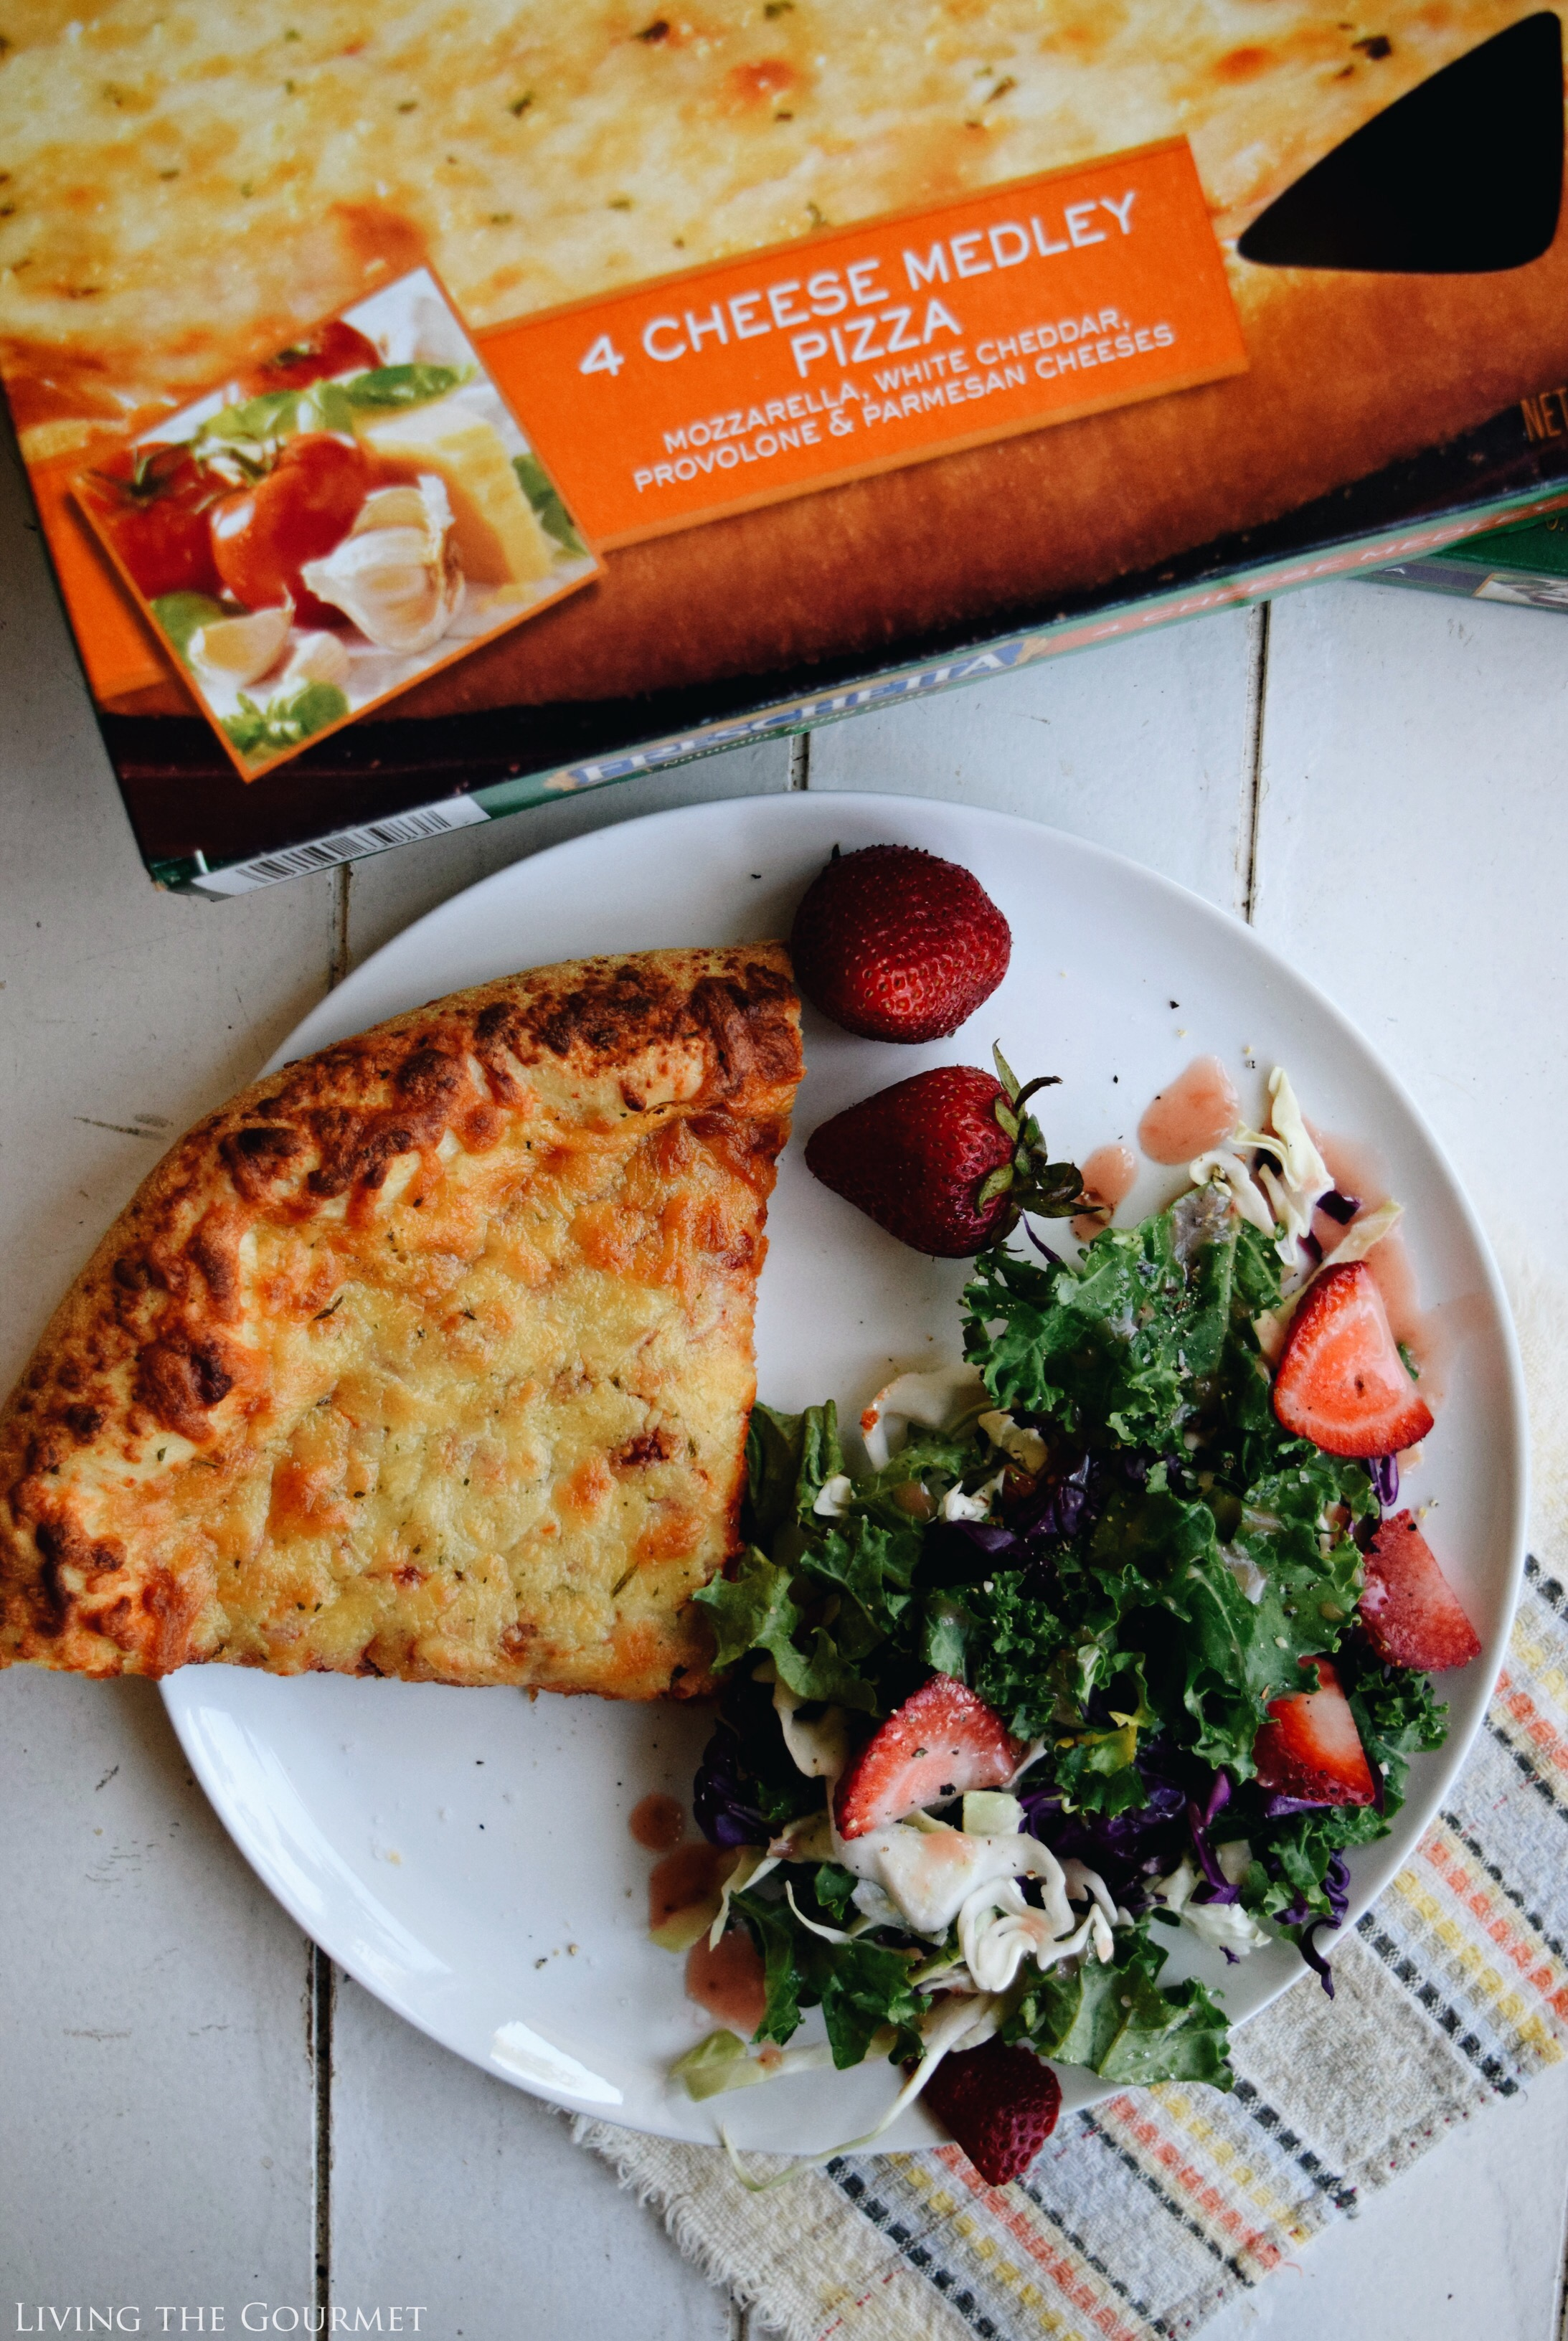 Living the Gourmet: Kale Salad with Strawberry Vinaigrette featuring Freschetta Pizza | #RealTasteForRealLife #ad